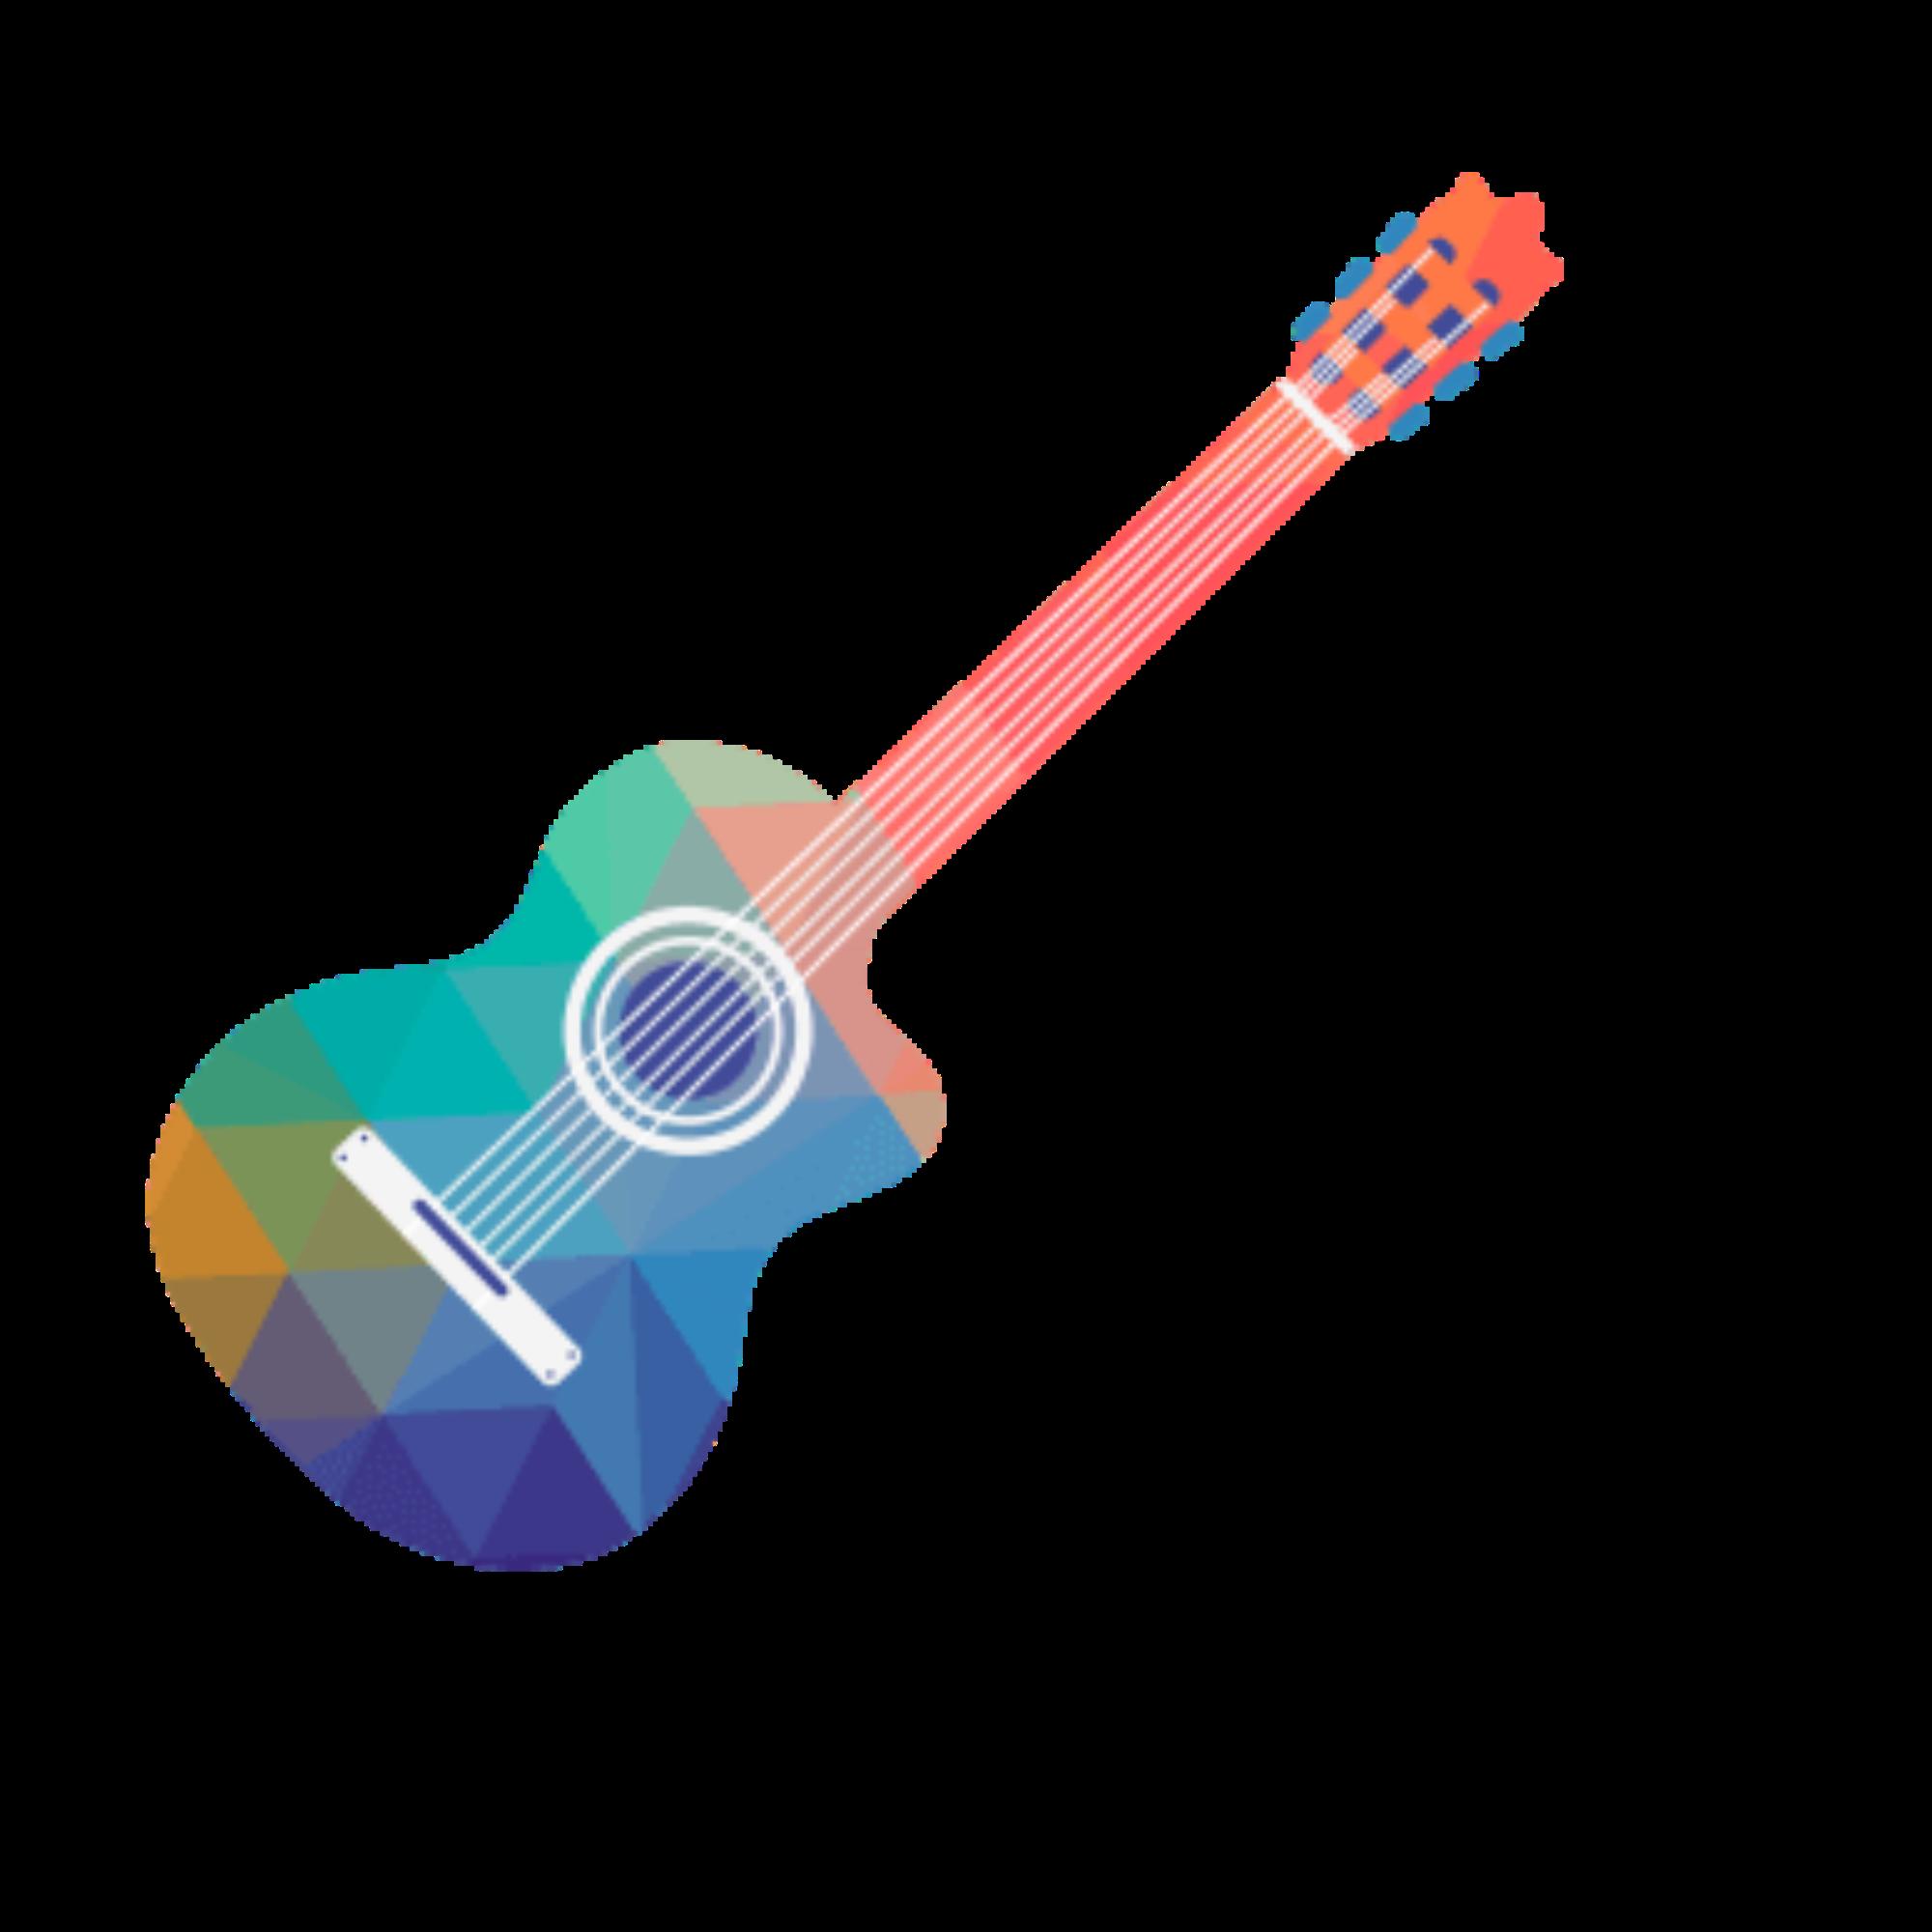 Readymade Music logos for business websites social media